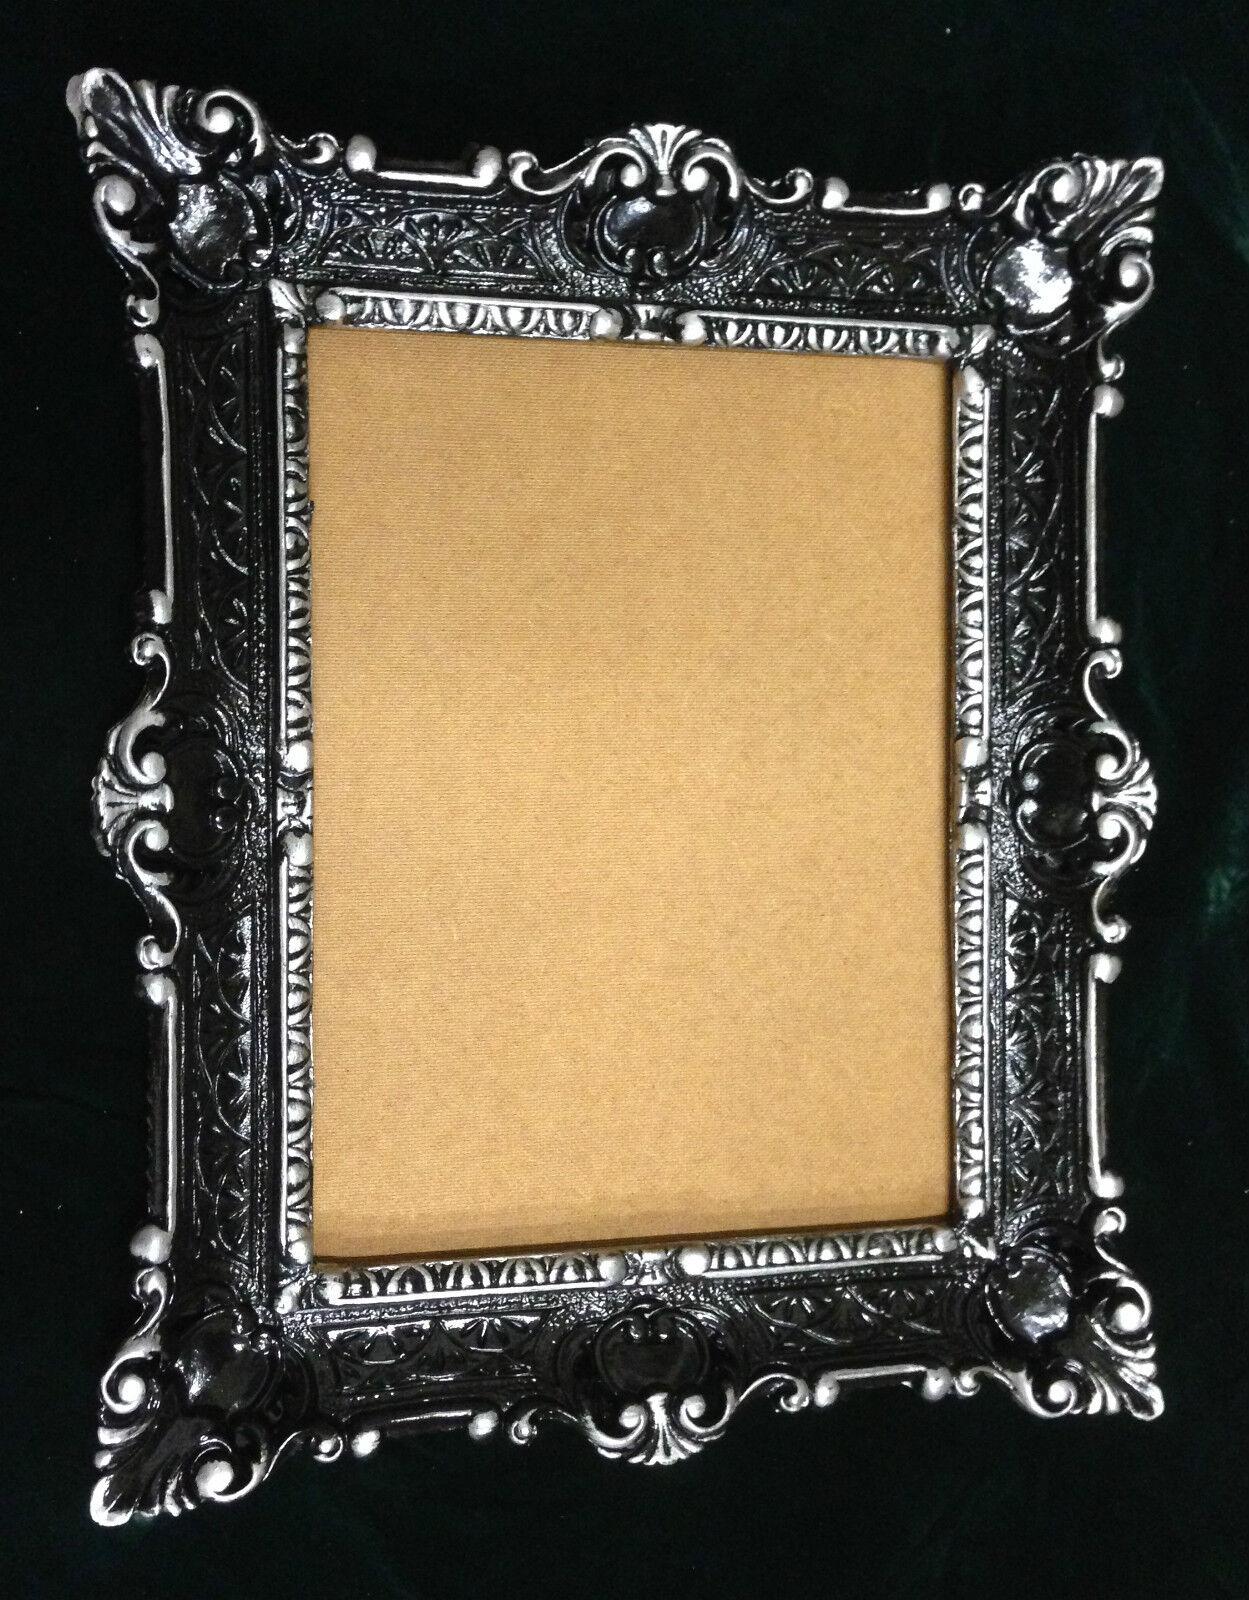 bilderrahmen antiksilber mit glas antik rechteckig 56x46 barock 30x40 fotorahmen ebay. Black Bedroom Furniture Sets. Home Design Ideas